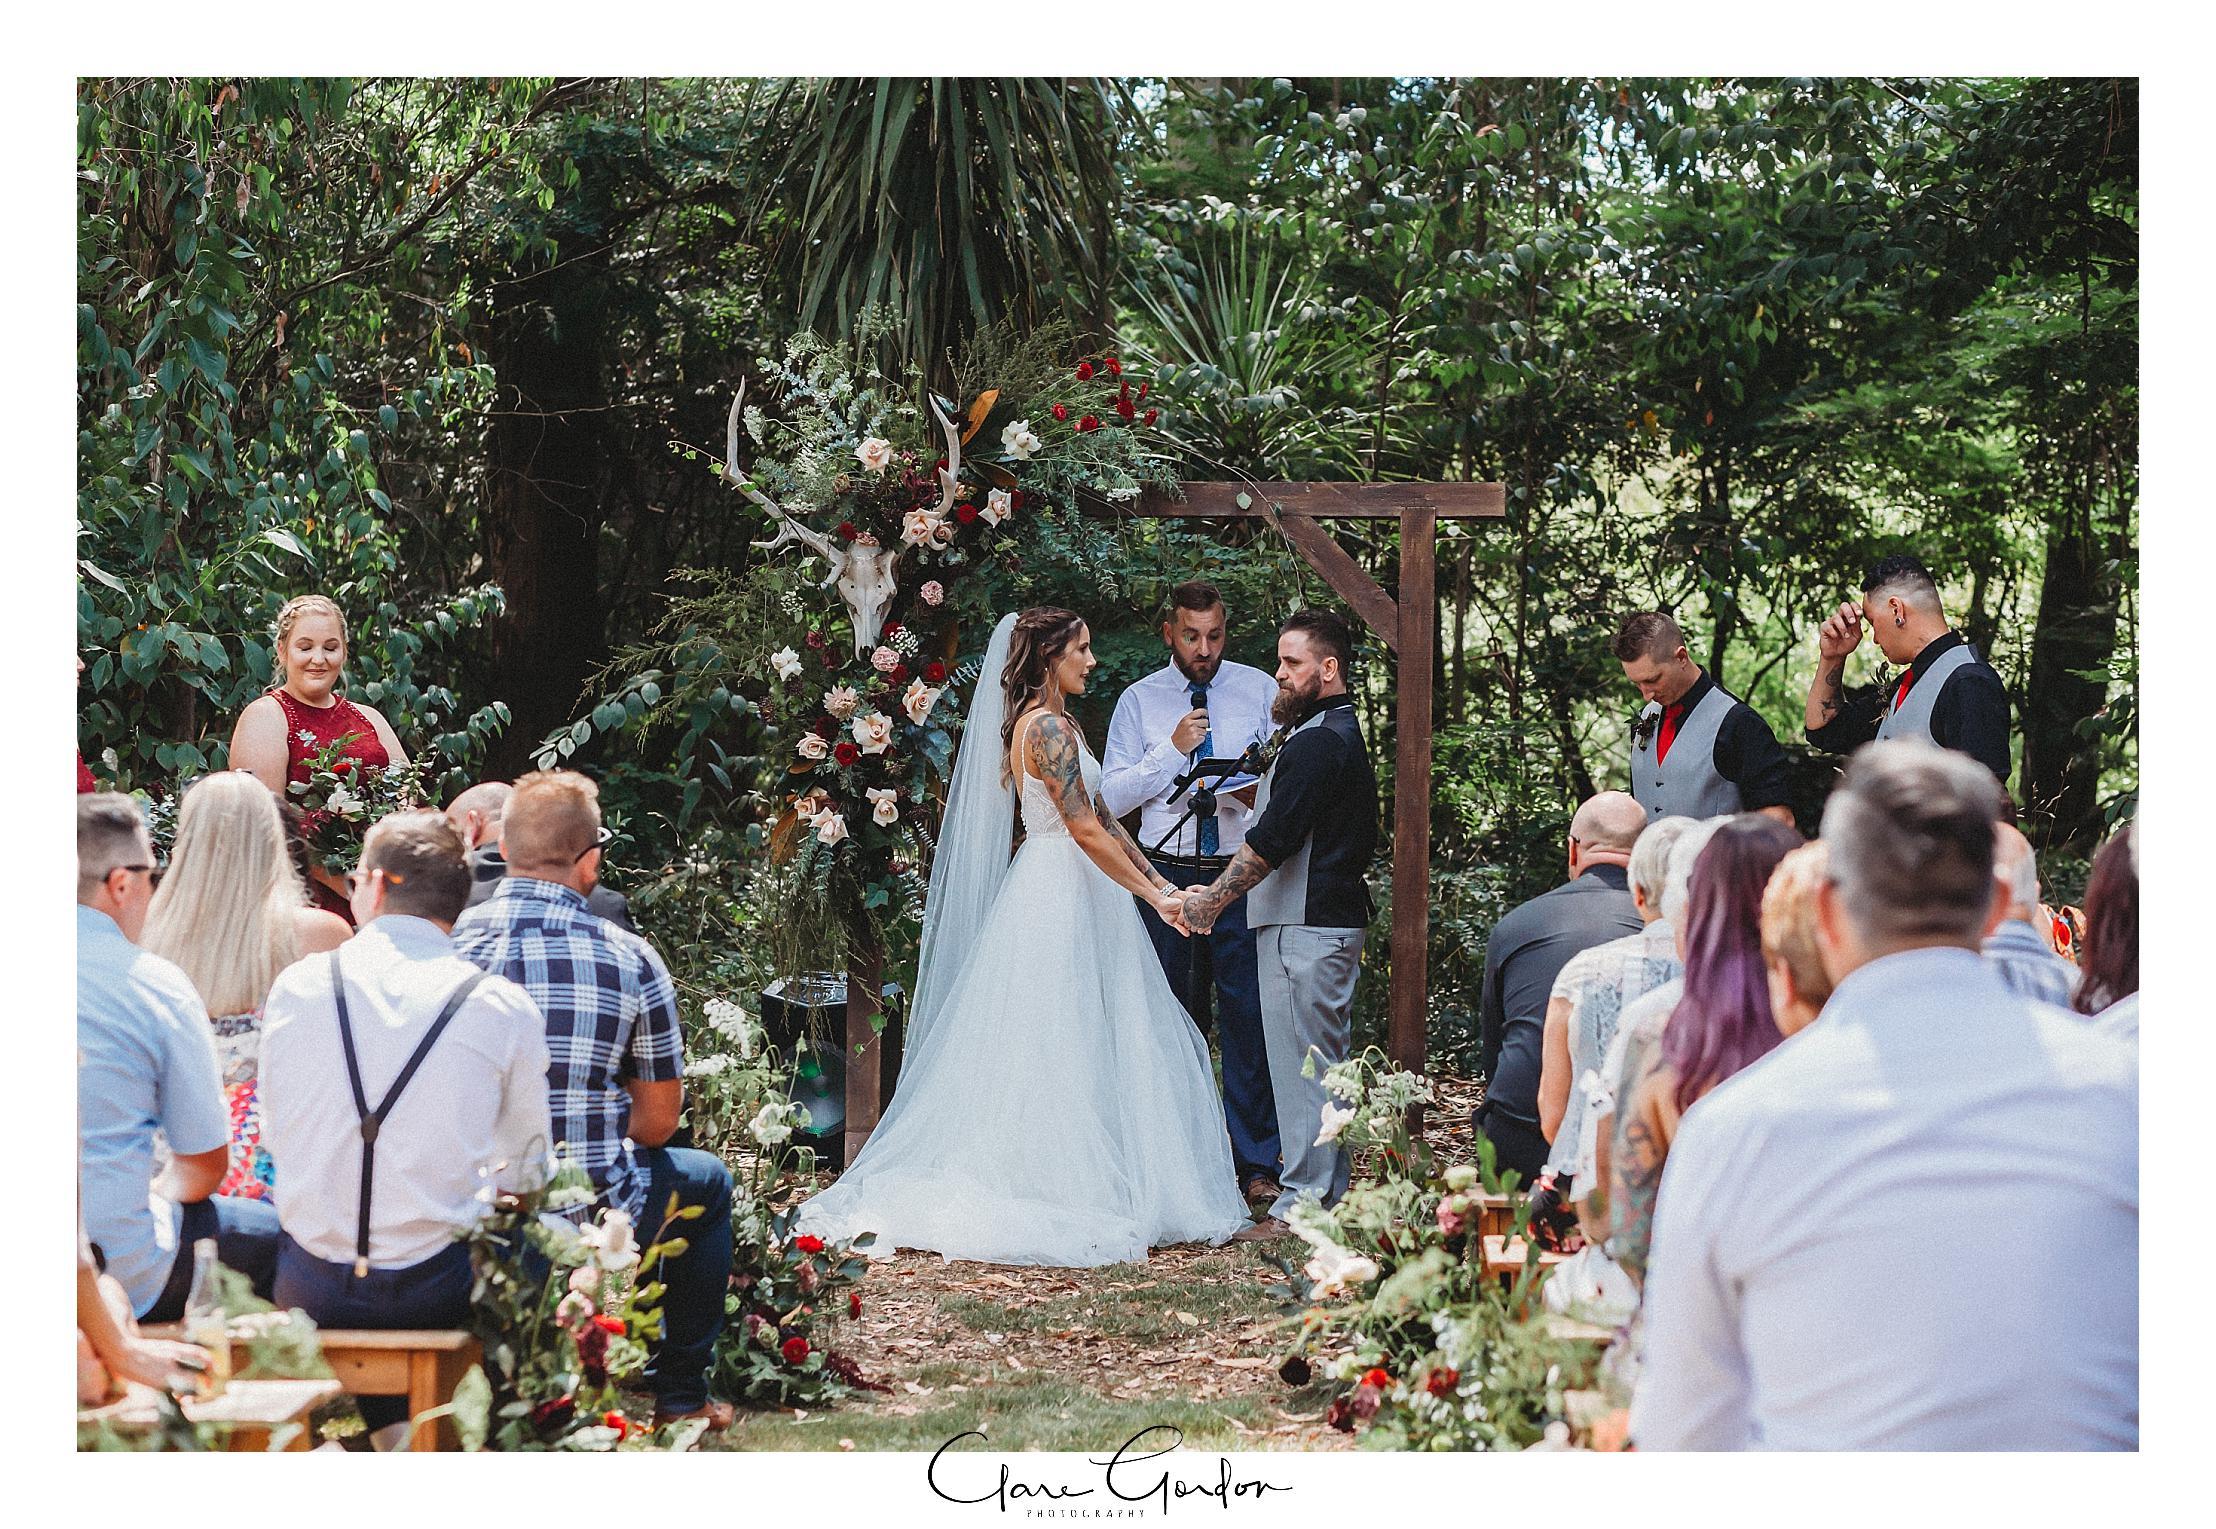 Waikato-wedding-photographer-Forest-weddnig-Hamilton-wedding-Newzealand (71).jpg